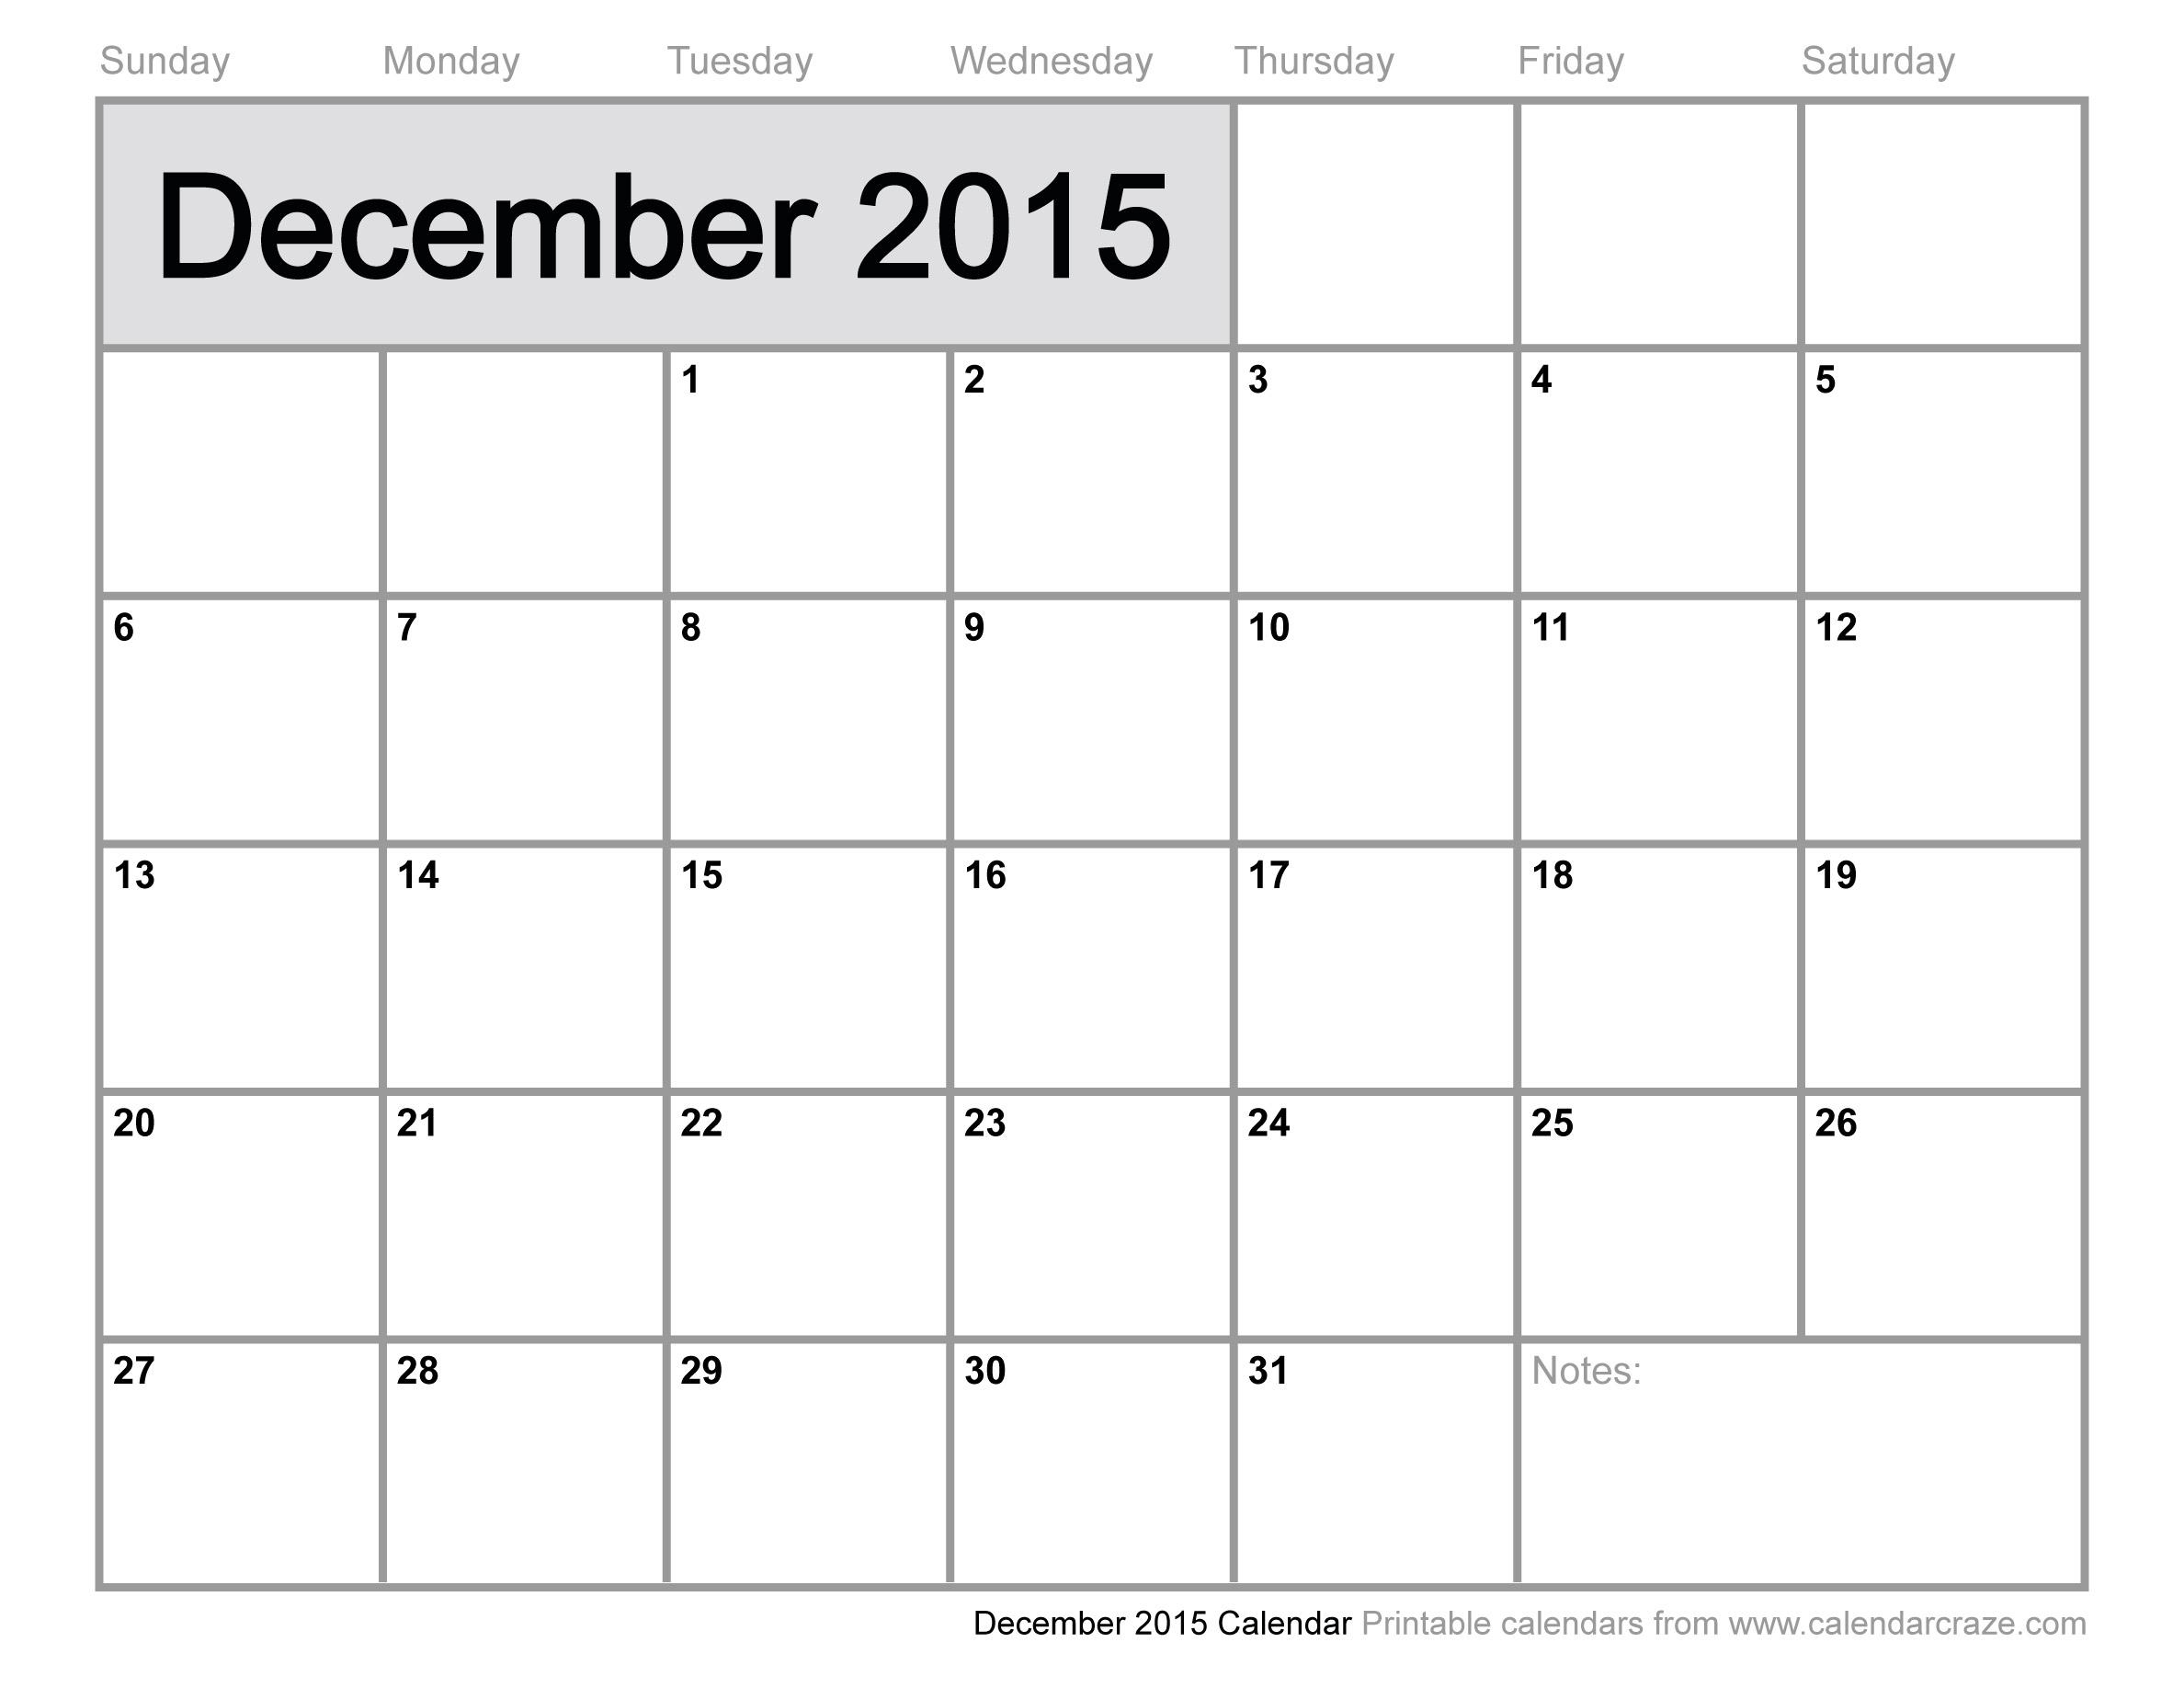 December 2015 Activity Calendar | Babcock Community Care Centre